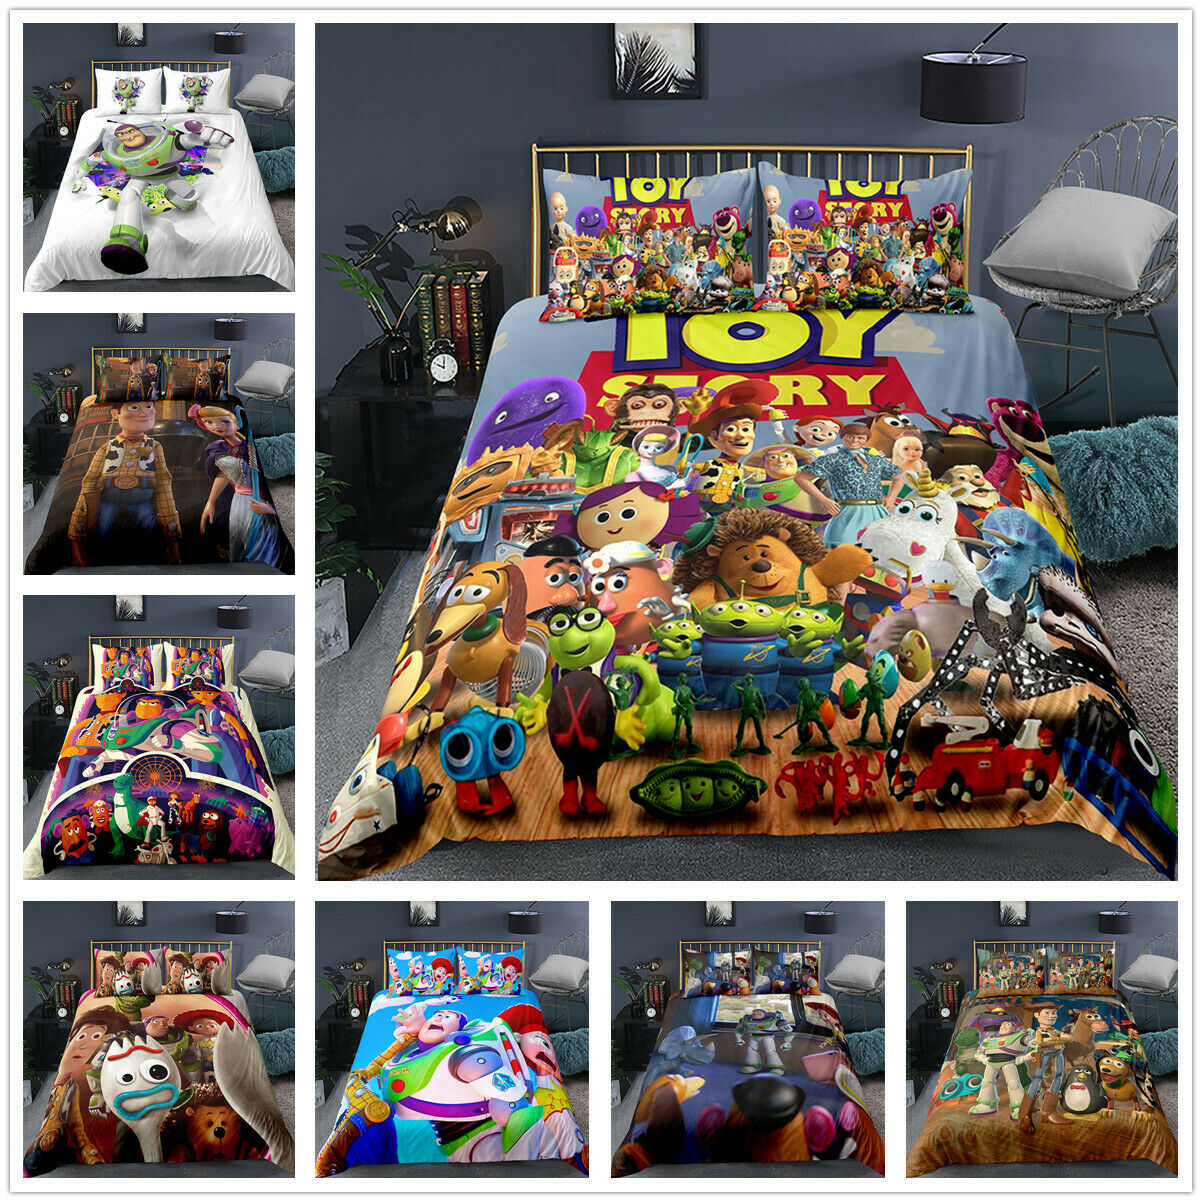 3D Disney Toy Story Woody Kids Bedding Set Duvet Cover Pillowcase Quilt  Cover